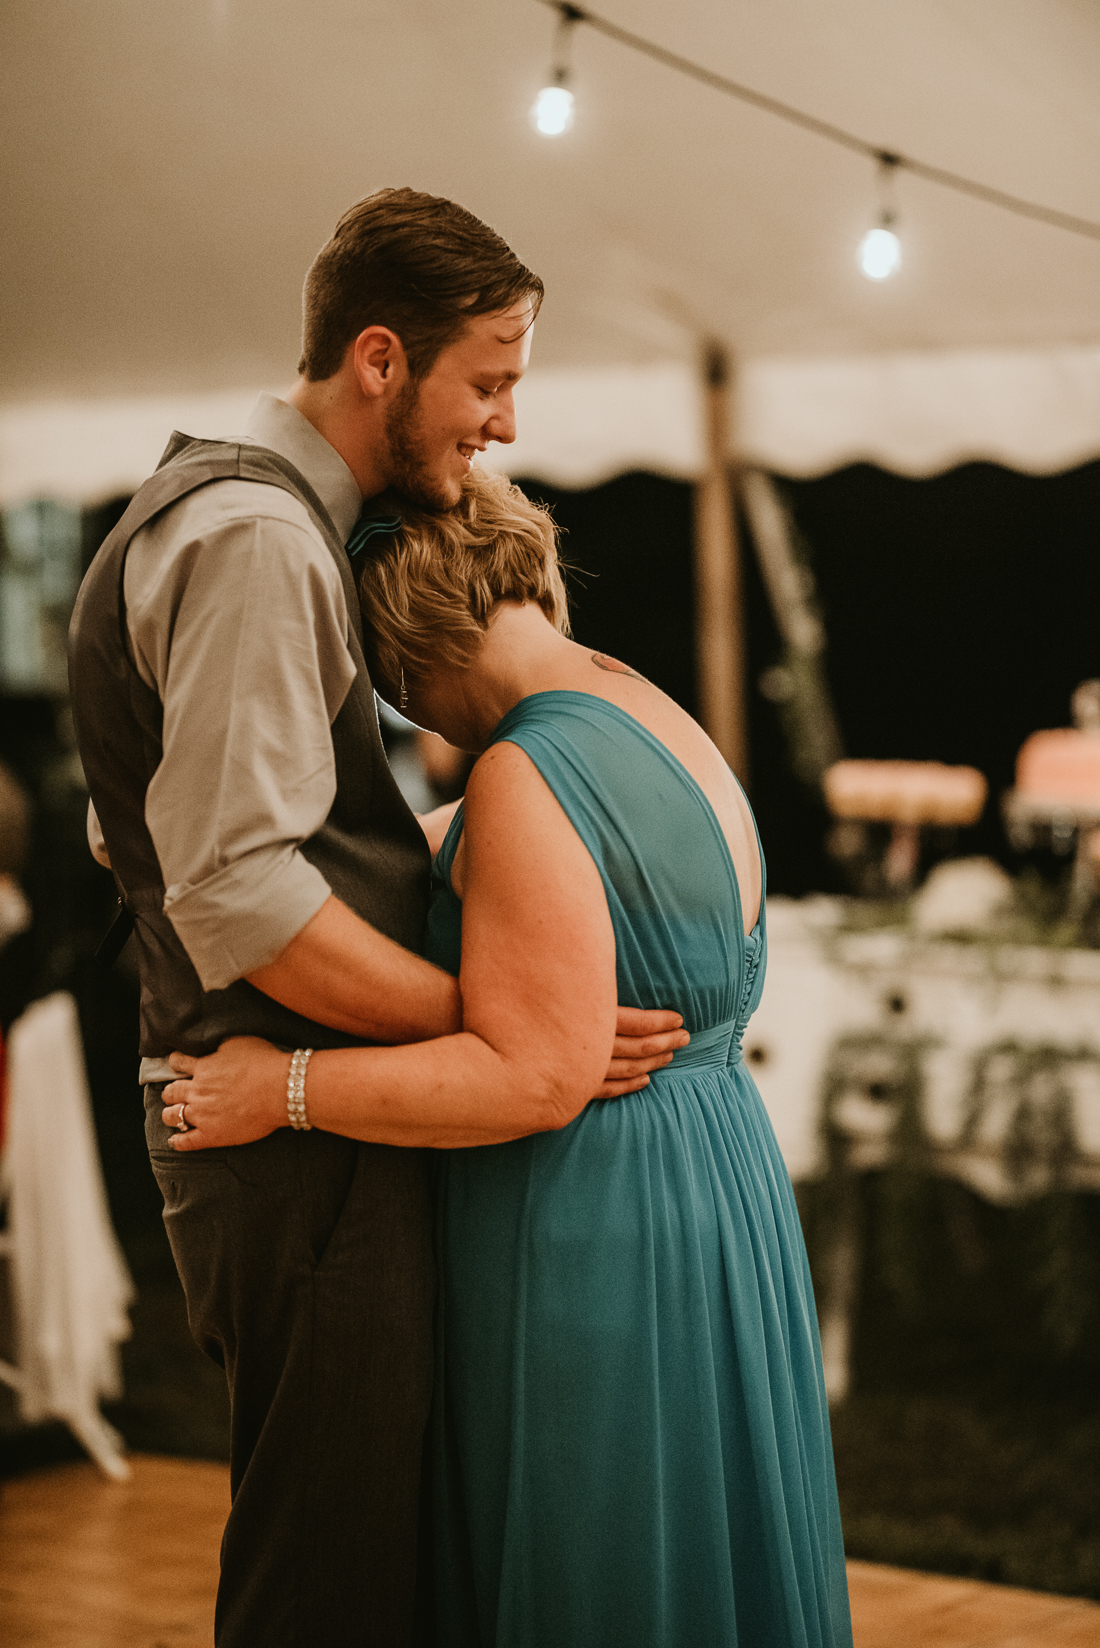 olivia_zay_wedding_09_2018-7932.jpg